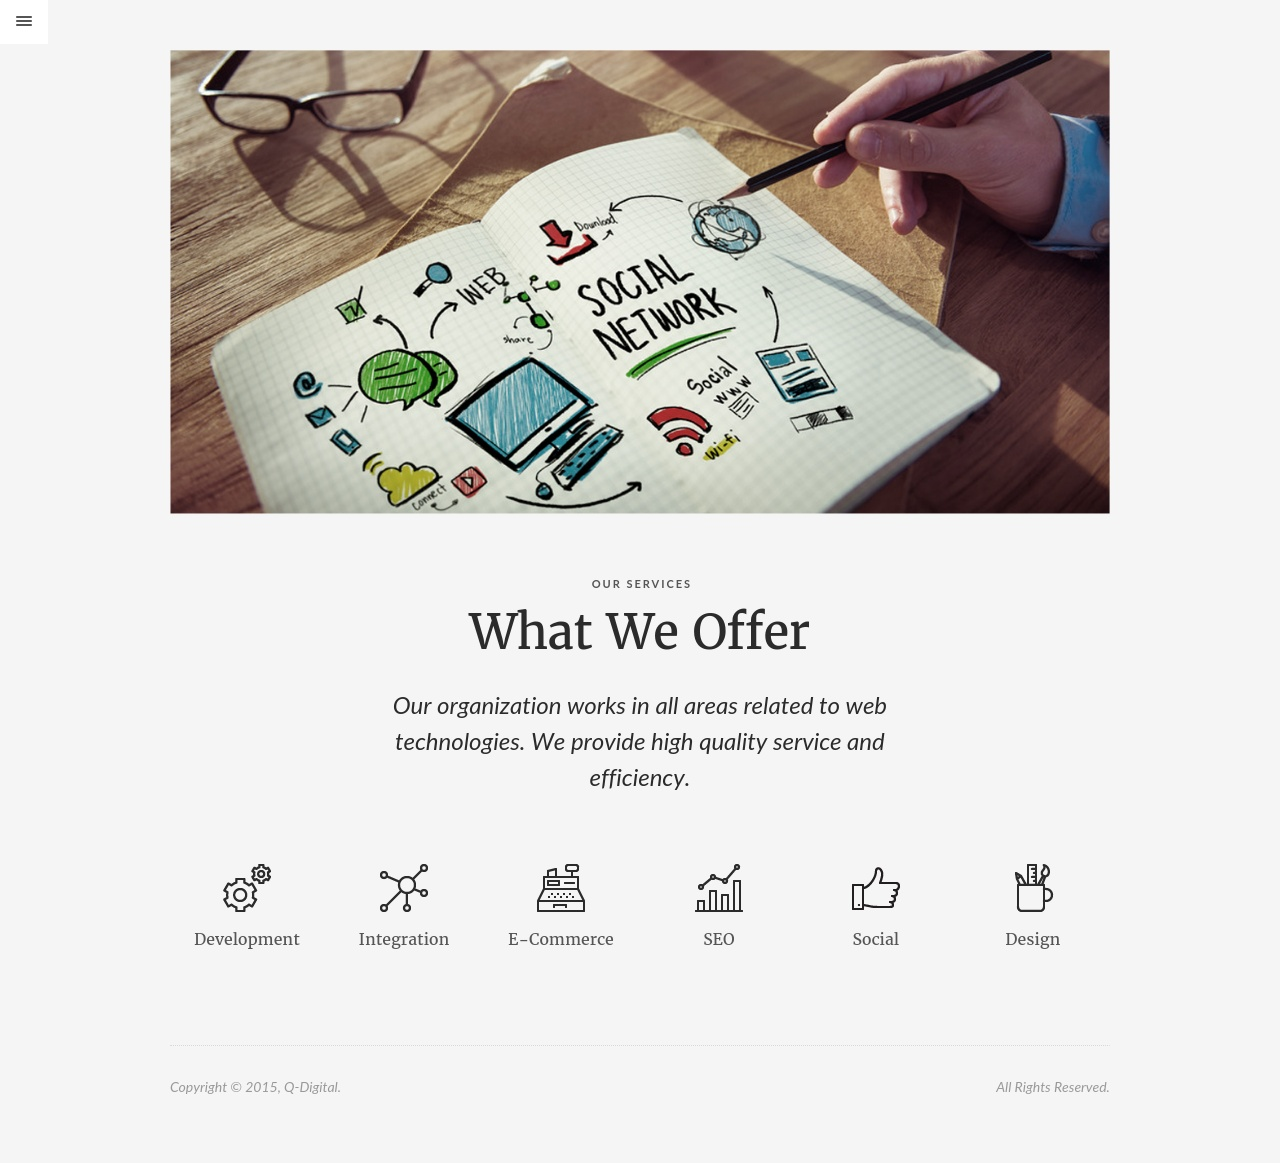 Сайт компании Q-Digital